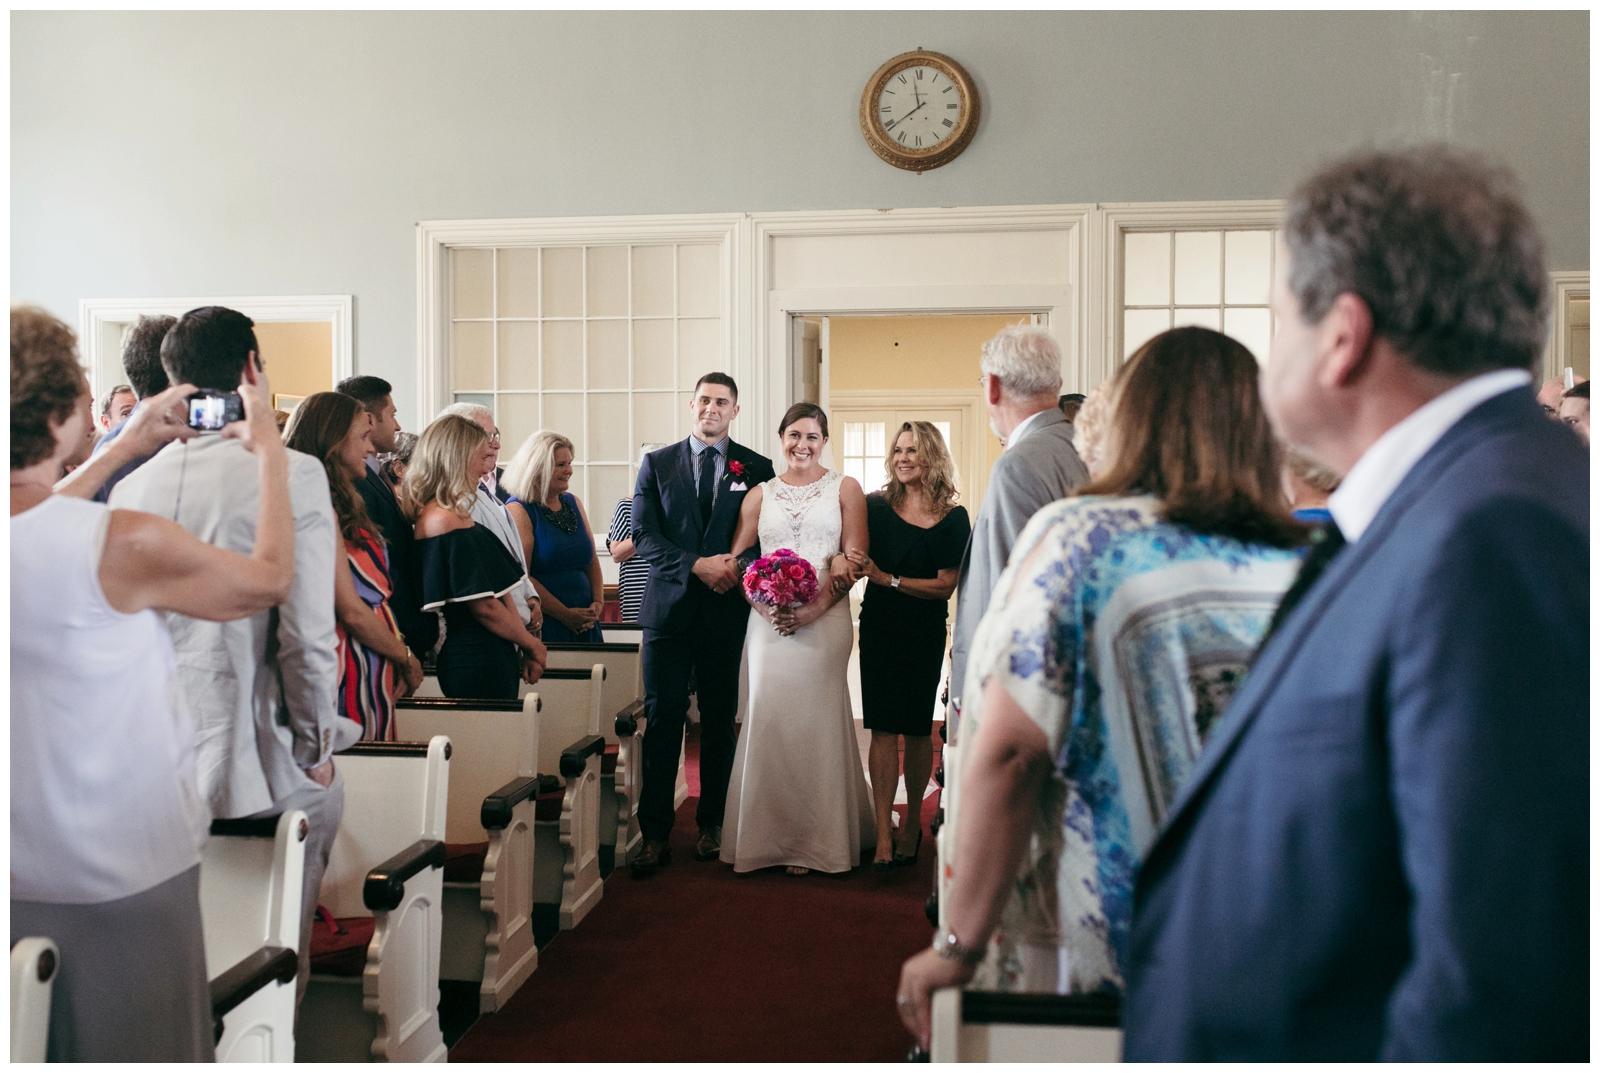 Bailey-Q-Photo-Backyard-Wedding-South-Shore-Boston-Wedding-Photographer-040.jpg